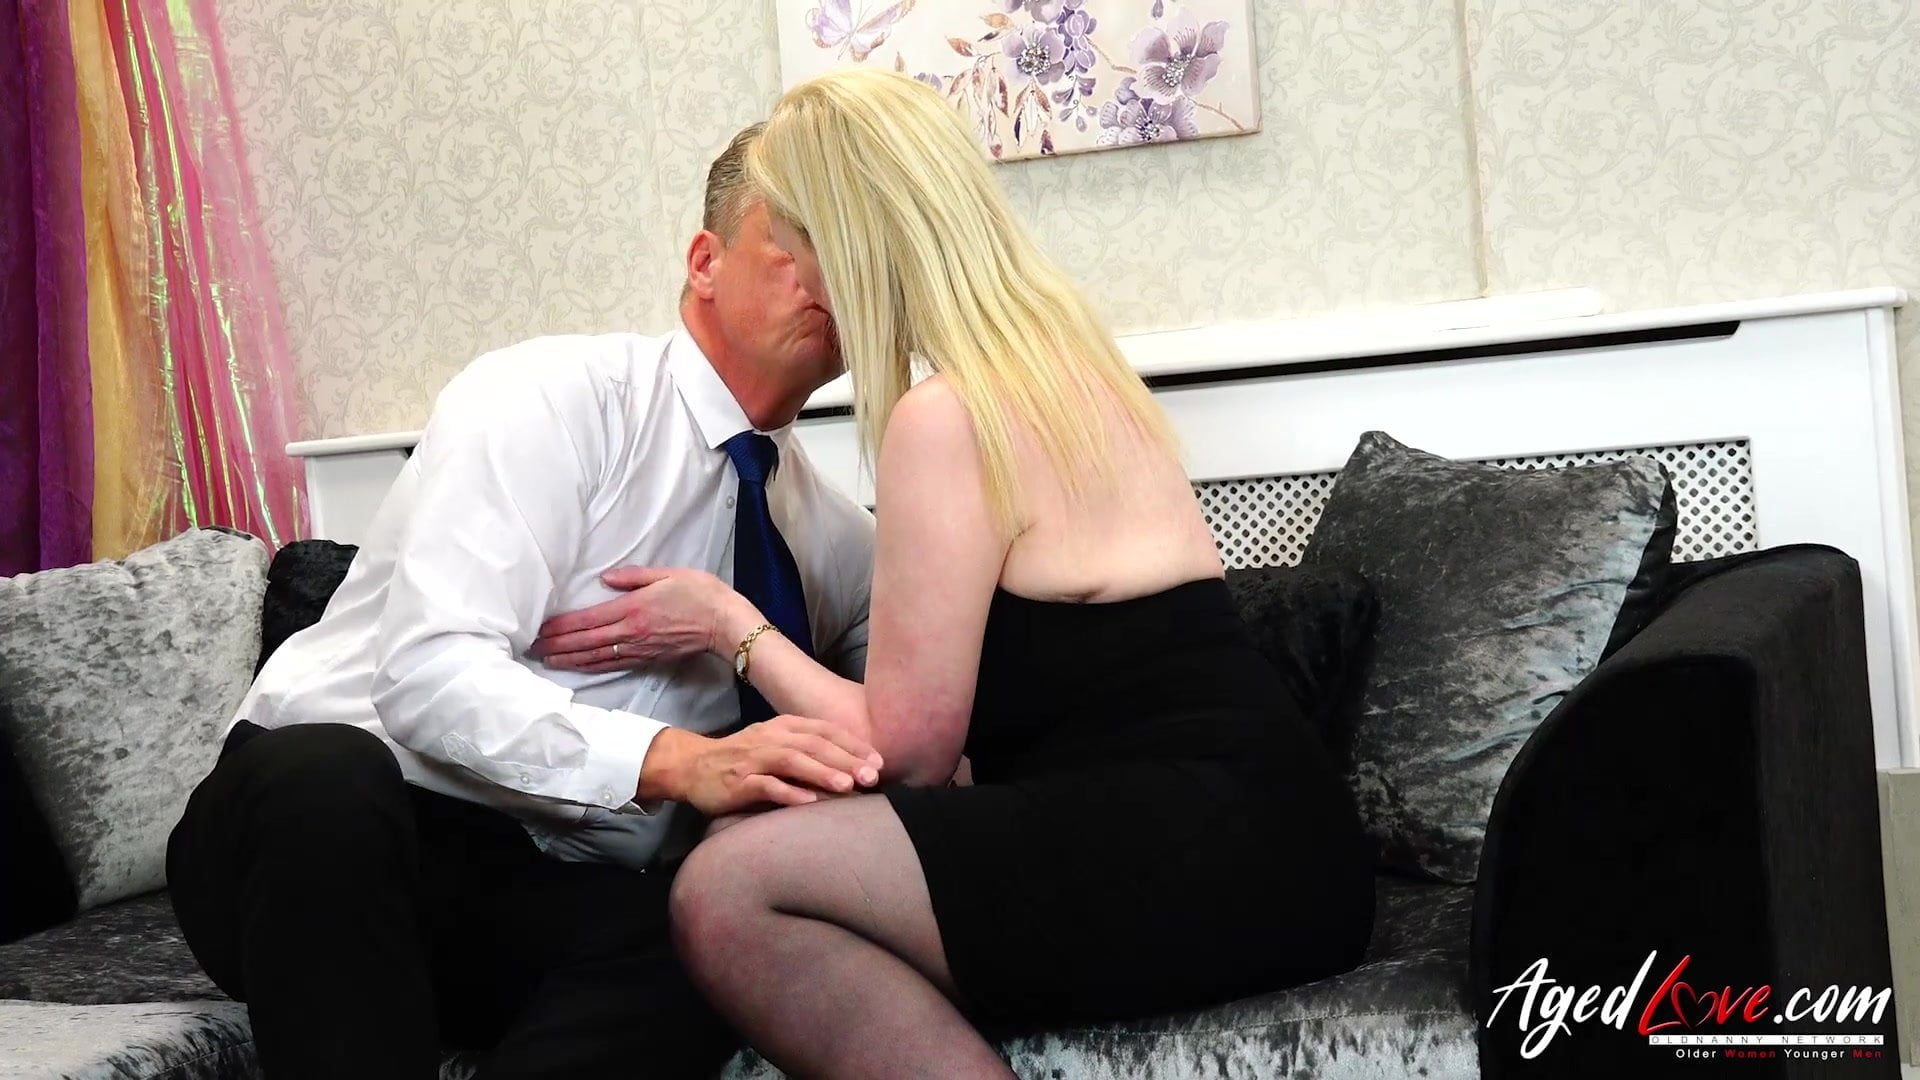 congratulate, remarkable idea wife slut punish tied allow clit have won